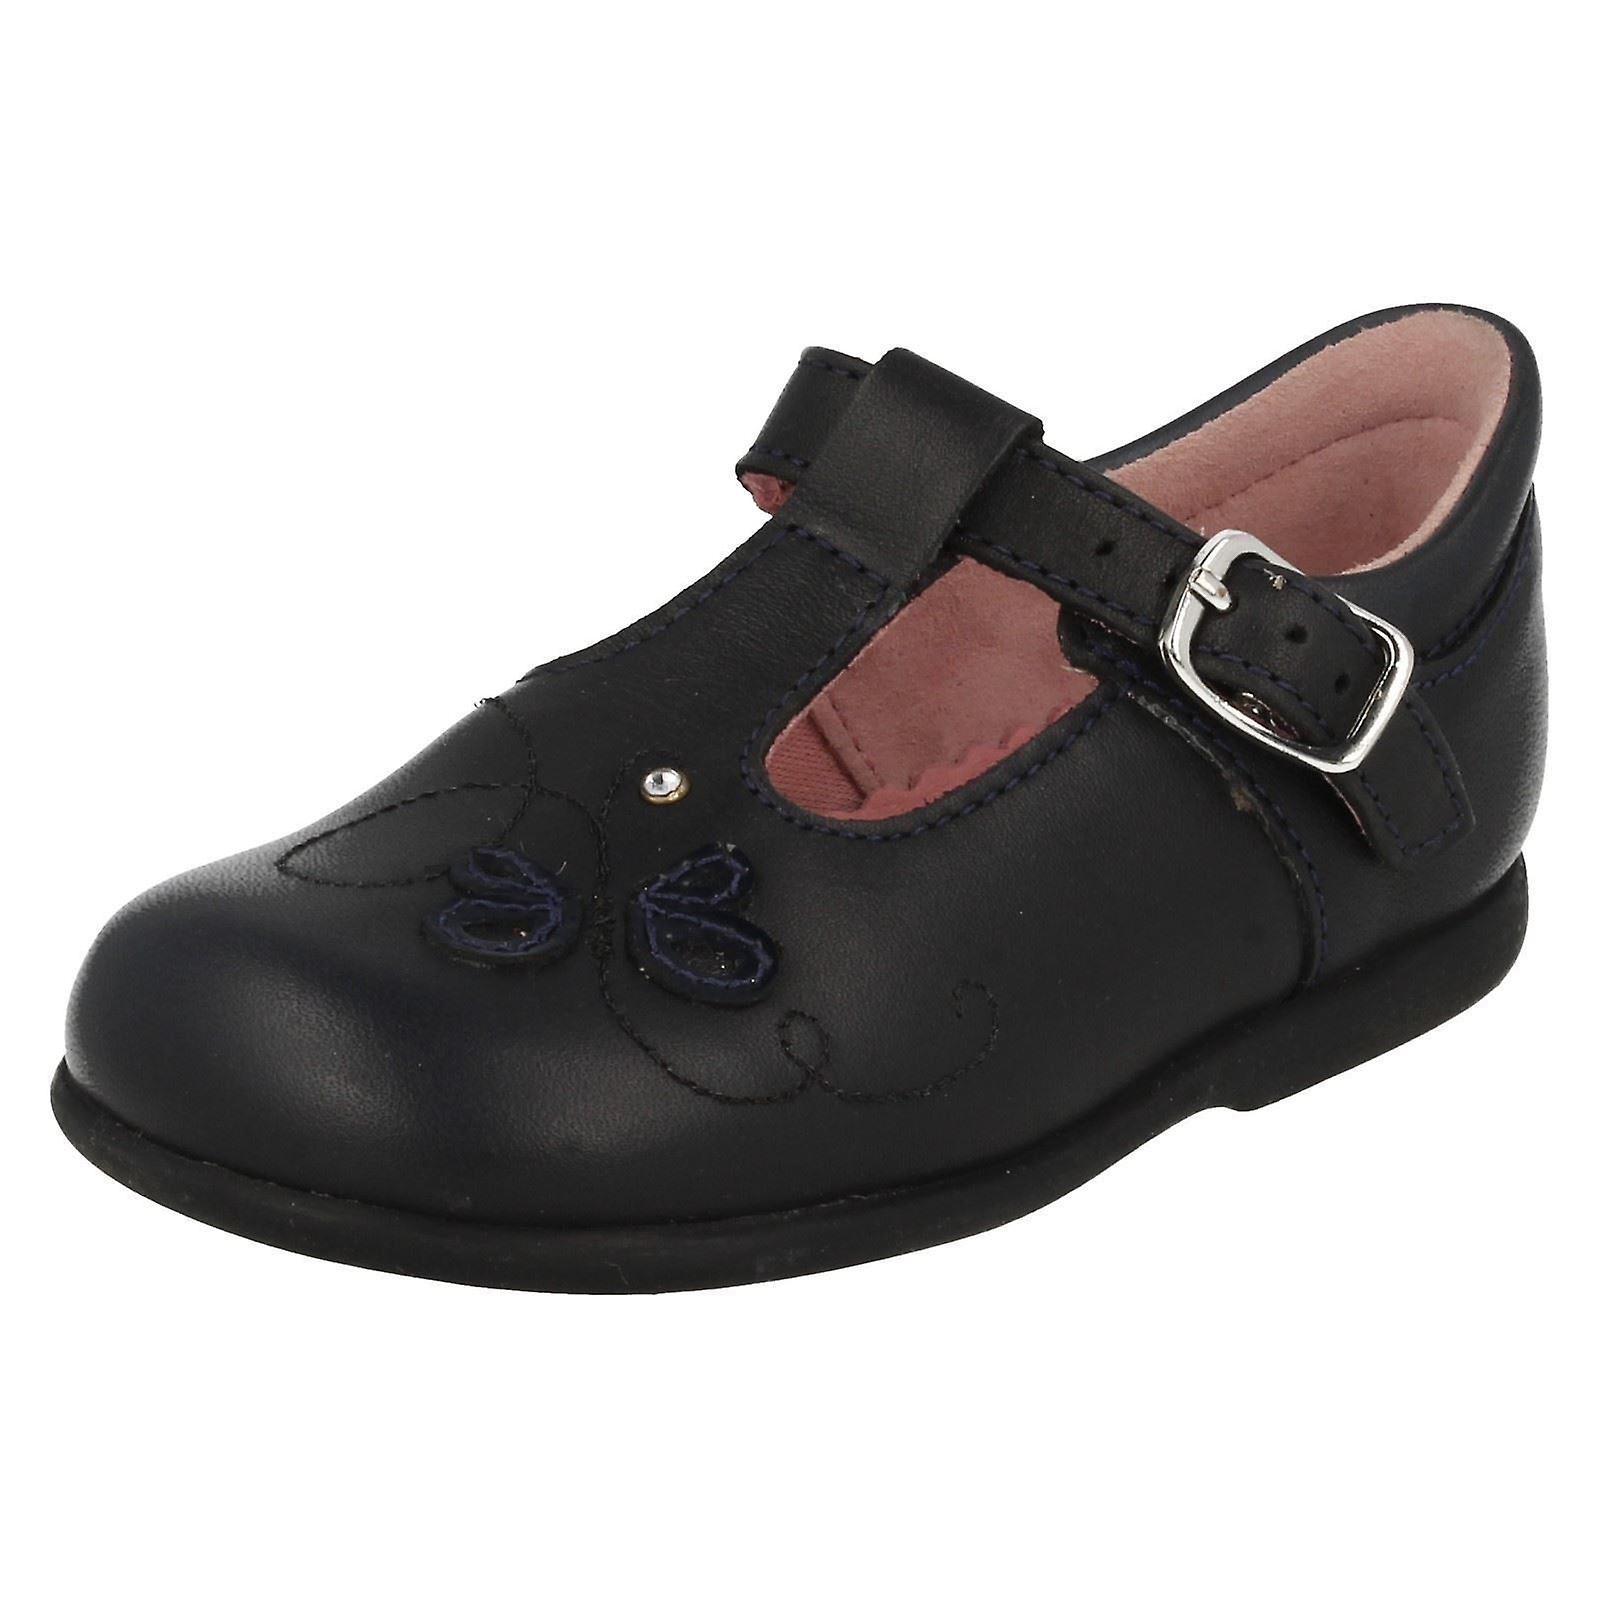 Girls Startrite Good Formal T-Bar Shoes Pixie-Super Good Startrite Ware-Gentlemen/Ladies 7d6438